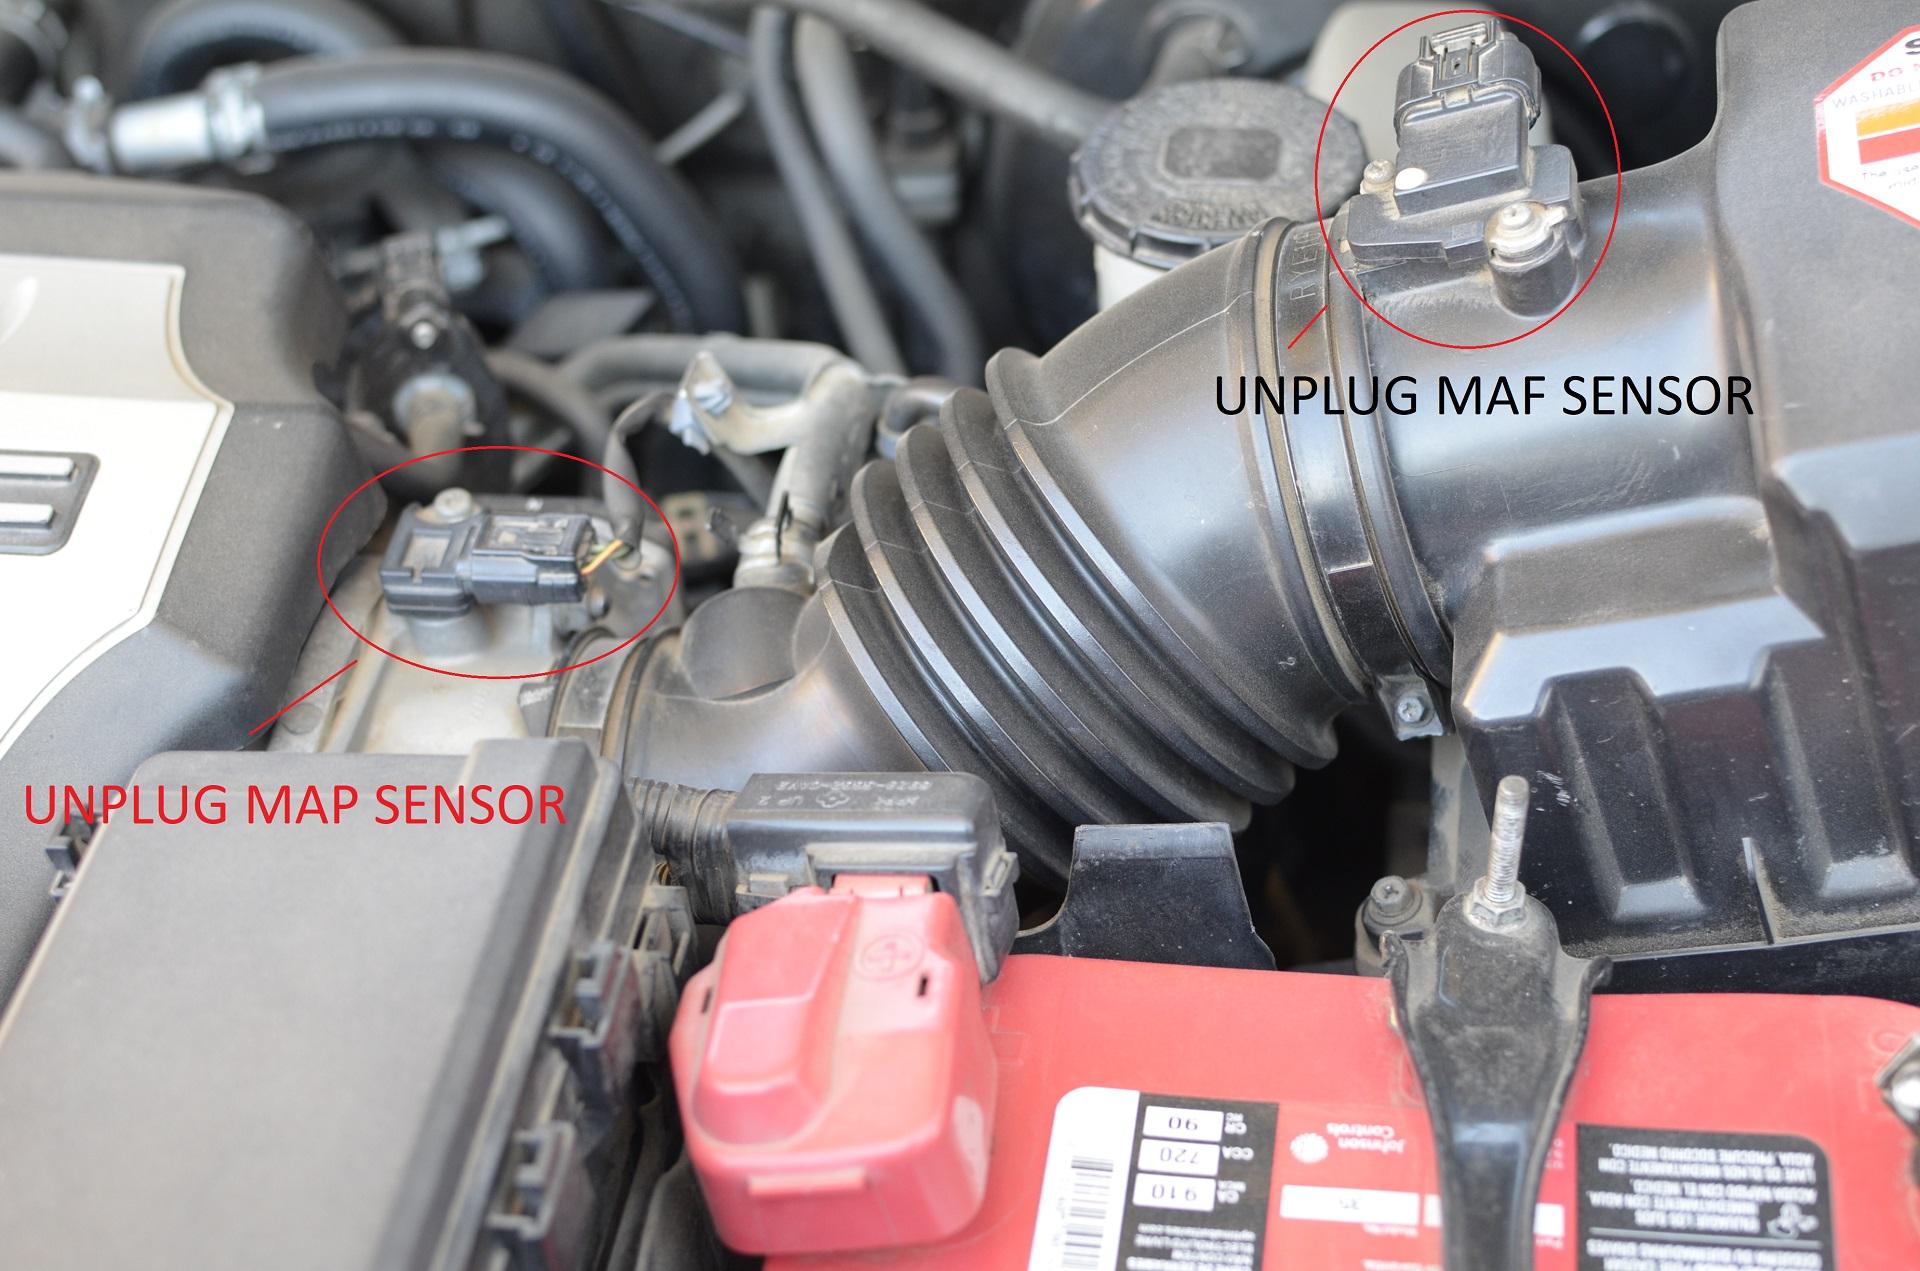 diy adjusting valves in acura mdx acura mdx forum acura mdx suv rh mdxers org Acura 2006 MDX 2005 Acura MDX